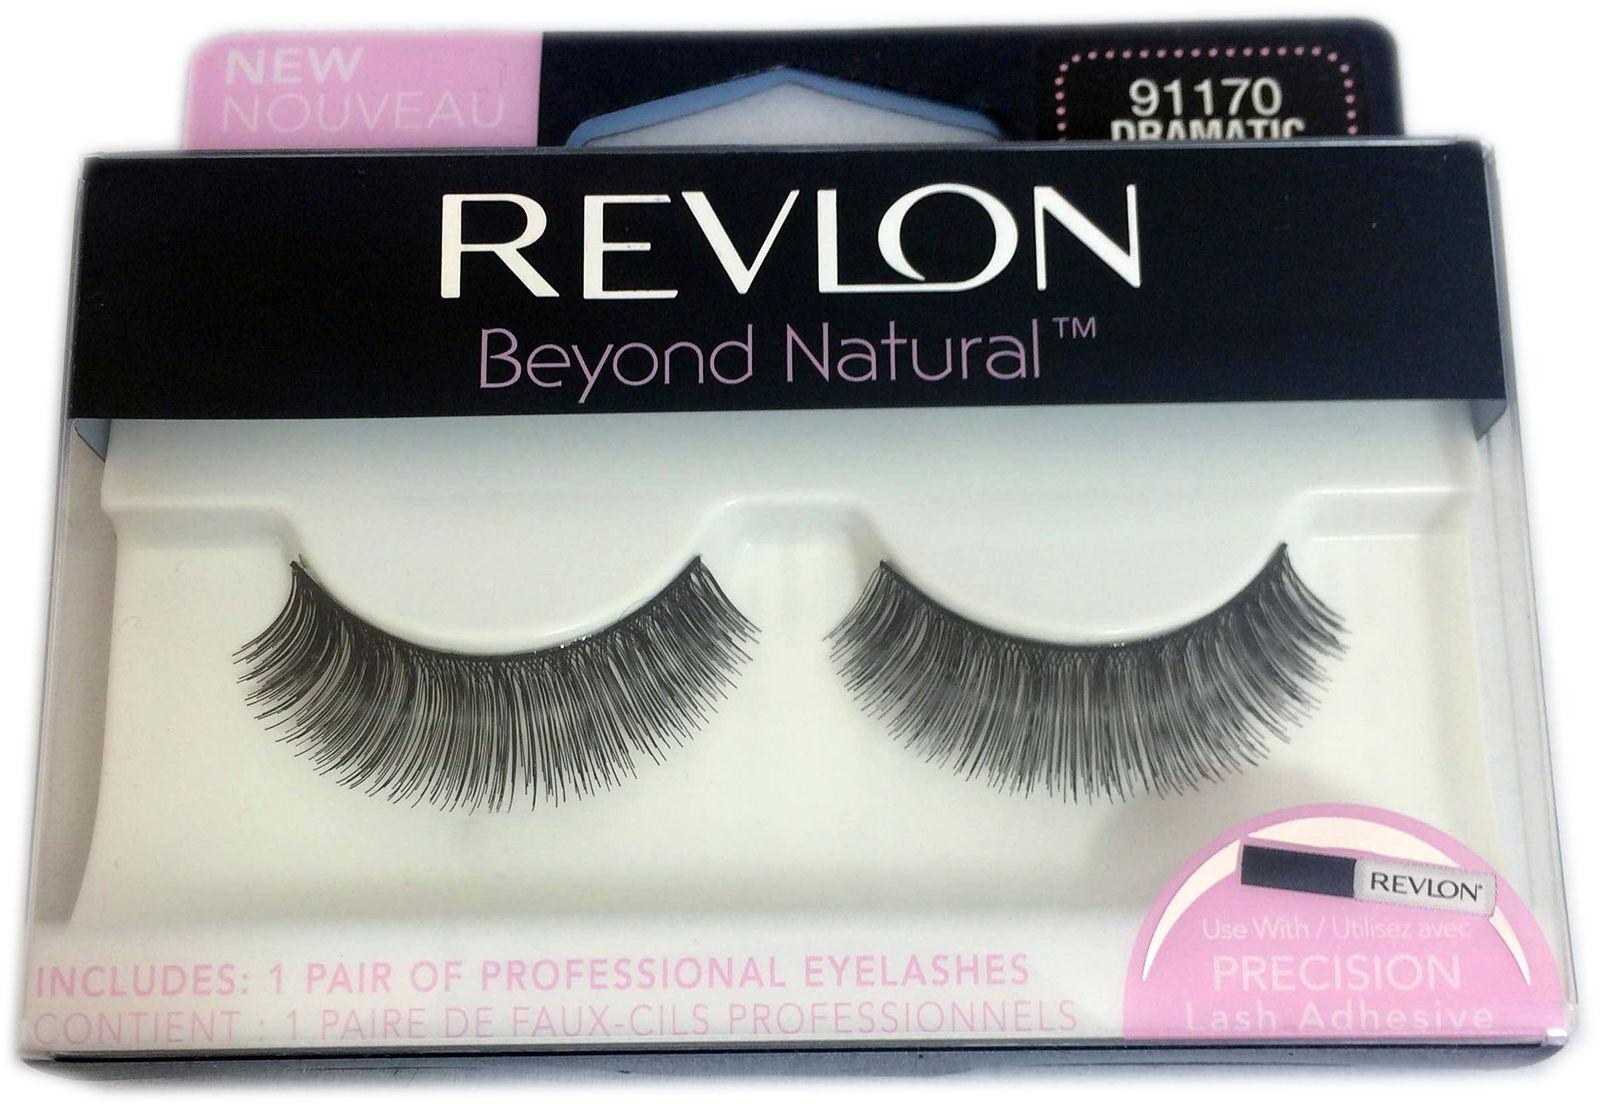 Revlon Beyond Natural 1 Pair False Eyelashes 91170 Dramatic 3x